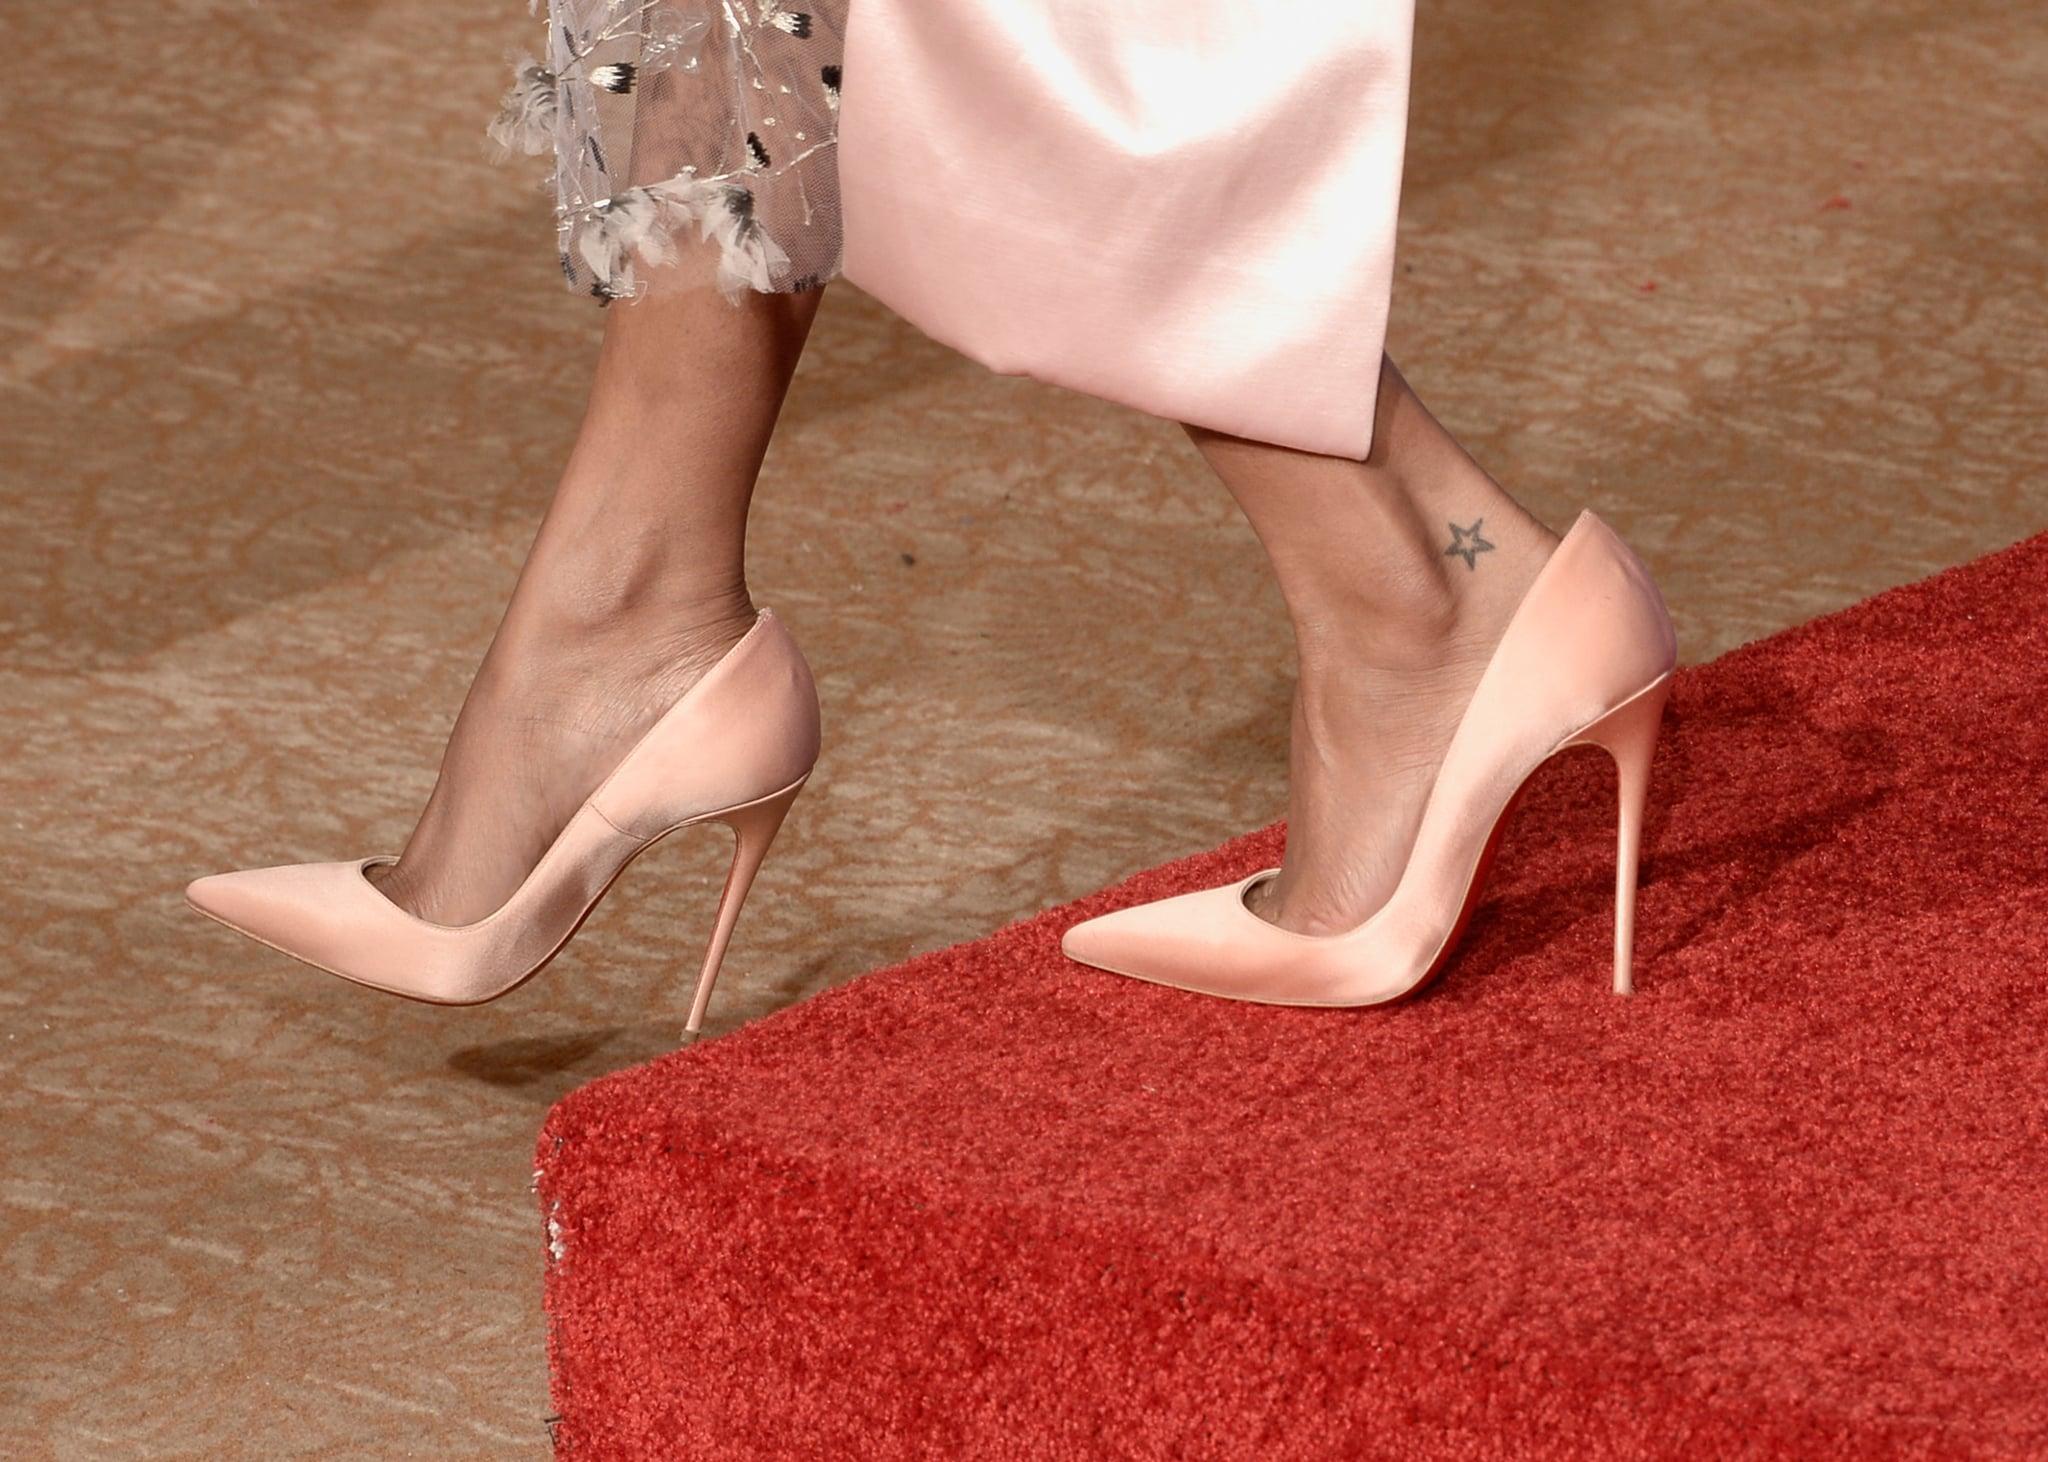 Zoe Saldana's satin Louboutins were the prettiest shade of petal pink.